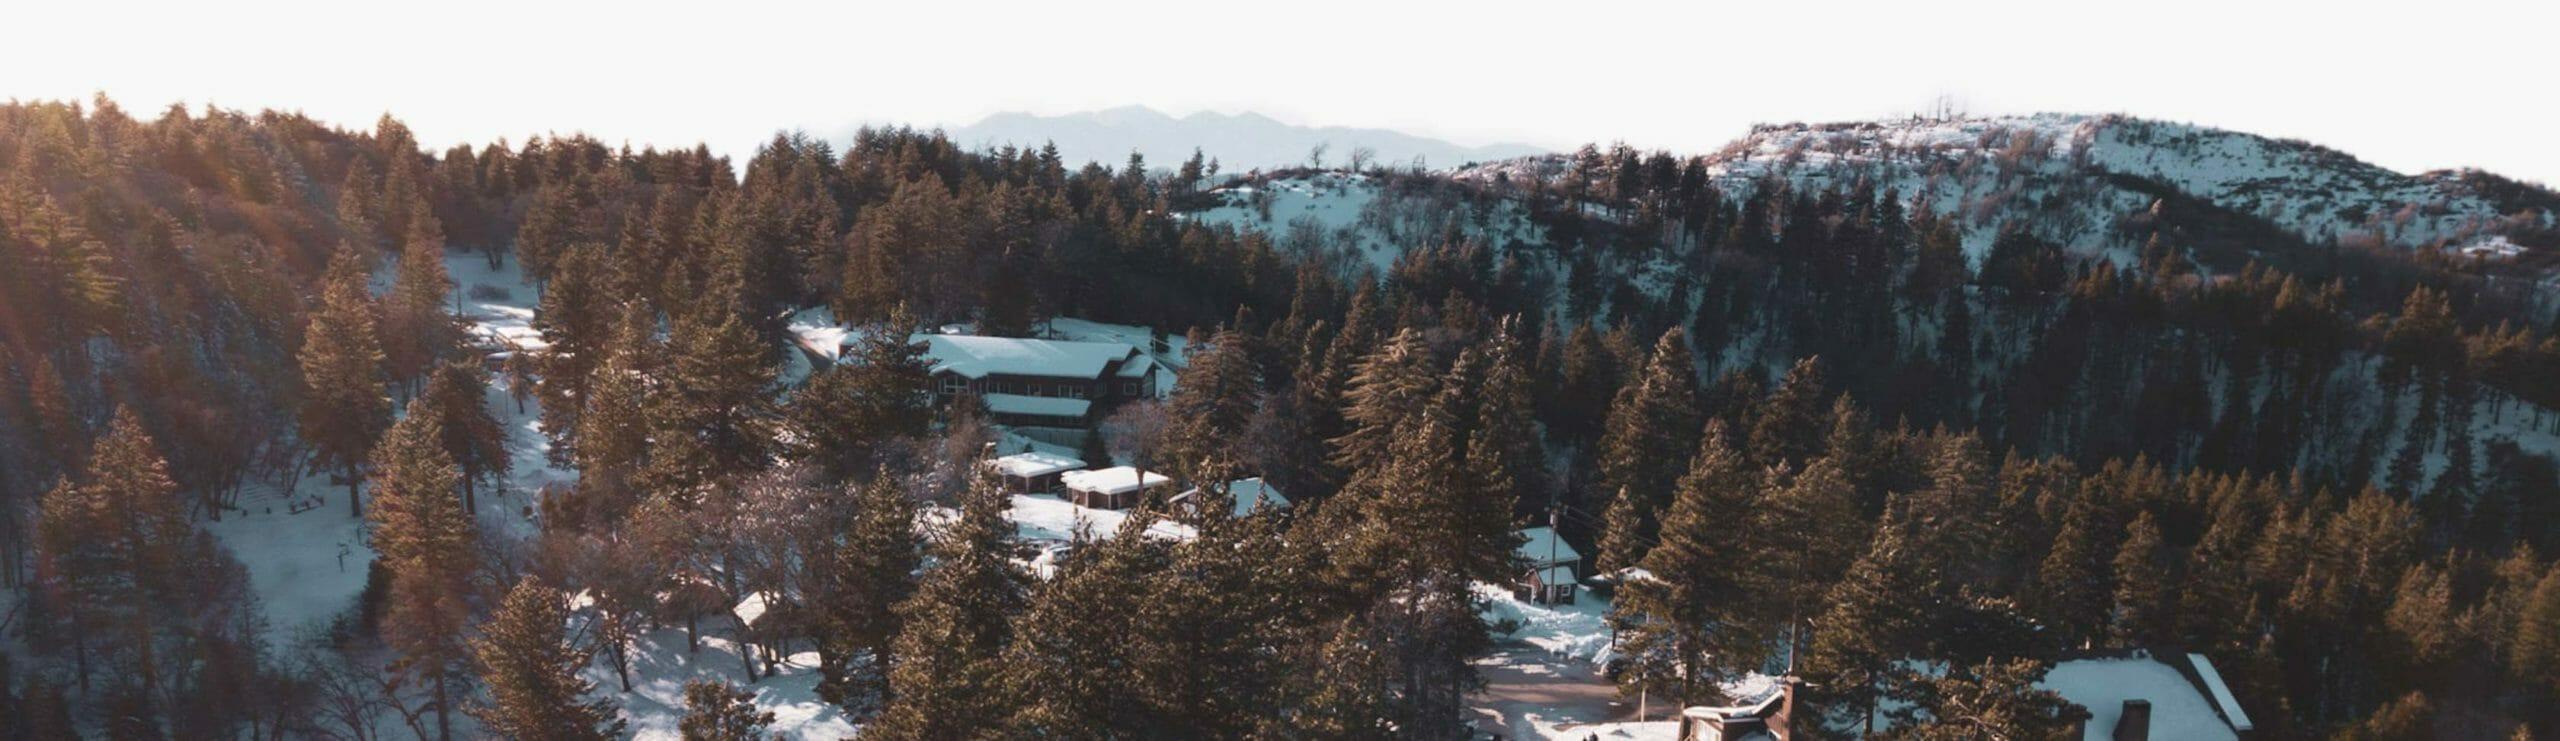 Aerial of Pali Institute in winter